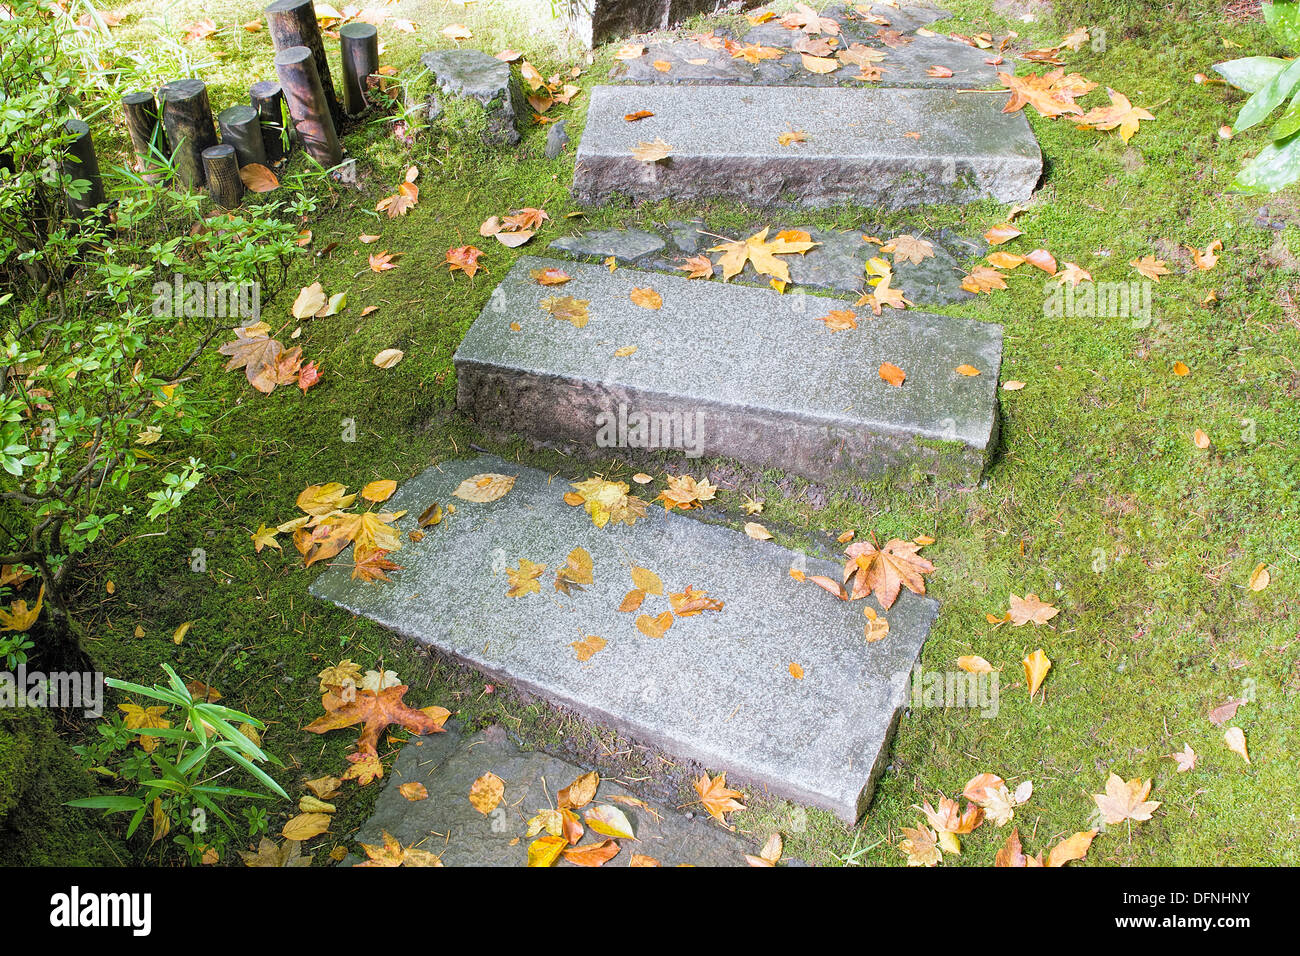 granitplatten garten, asiatisch inspirierten garten granit platten steinstufen mit moos, Design ideen